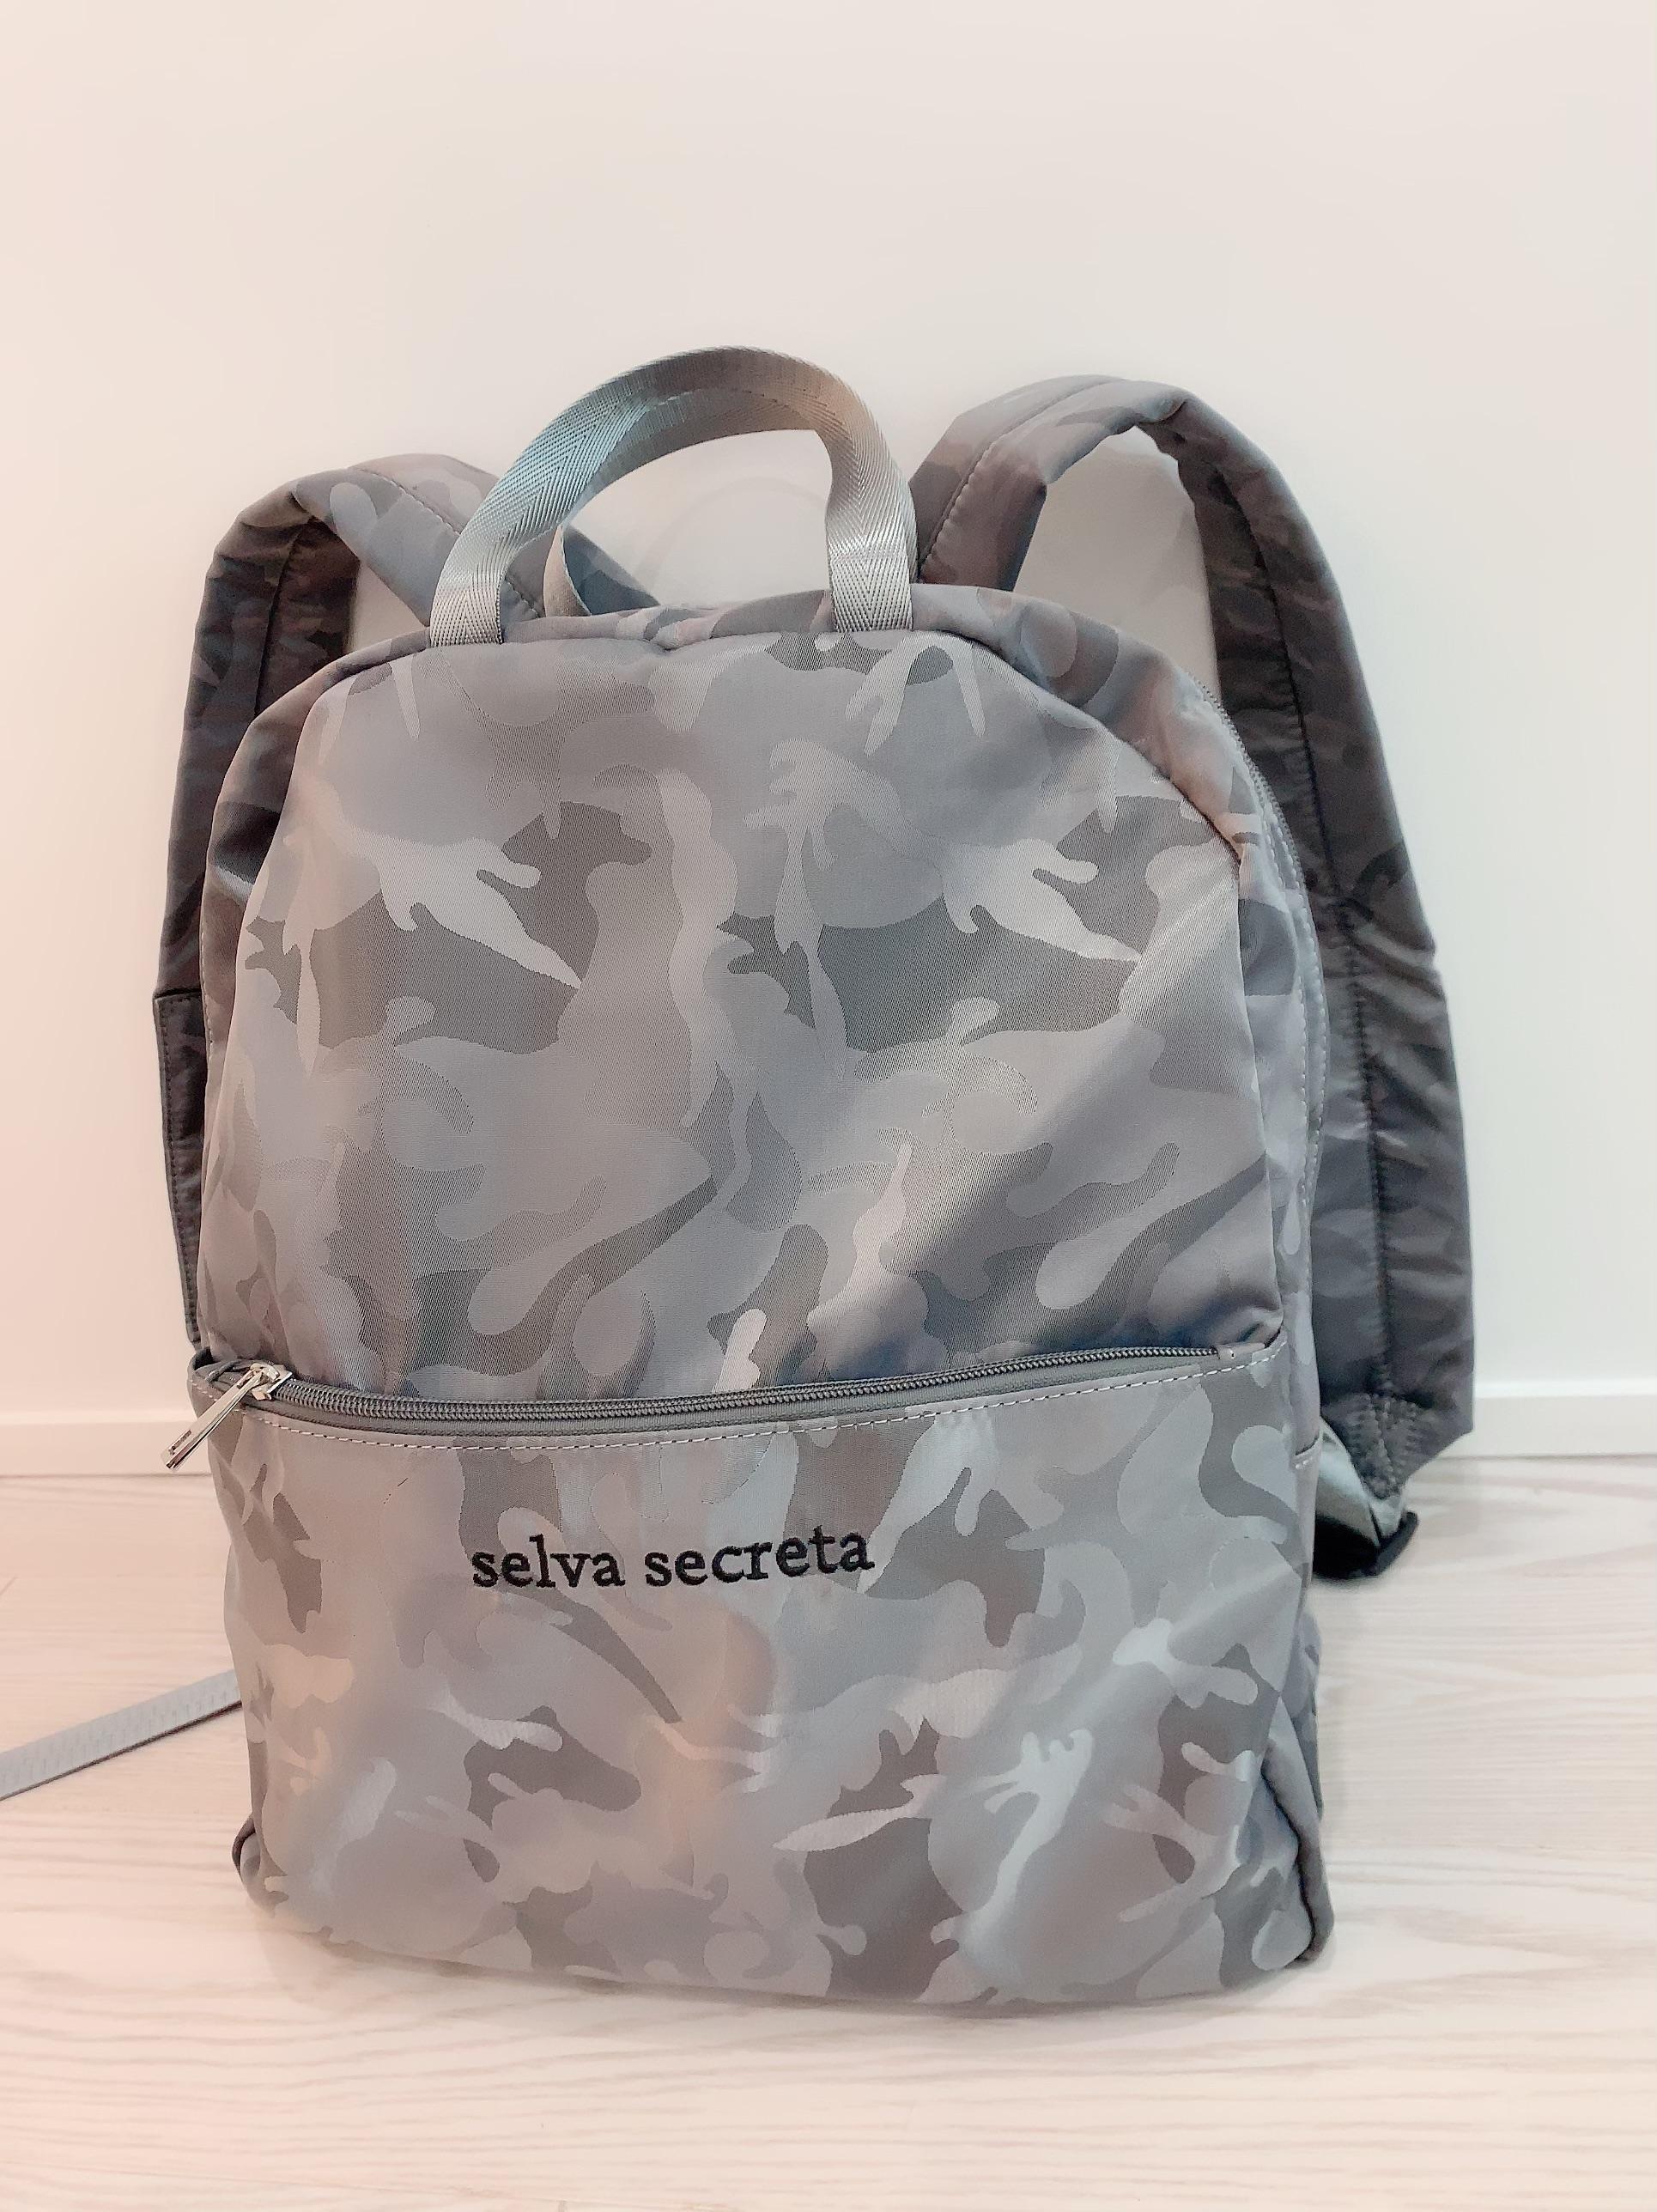 【selva secreta】RUCKSACK(camouflage-sliver)